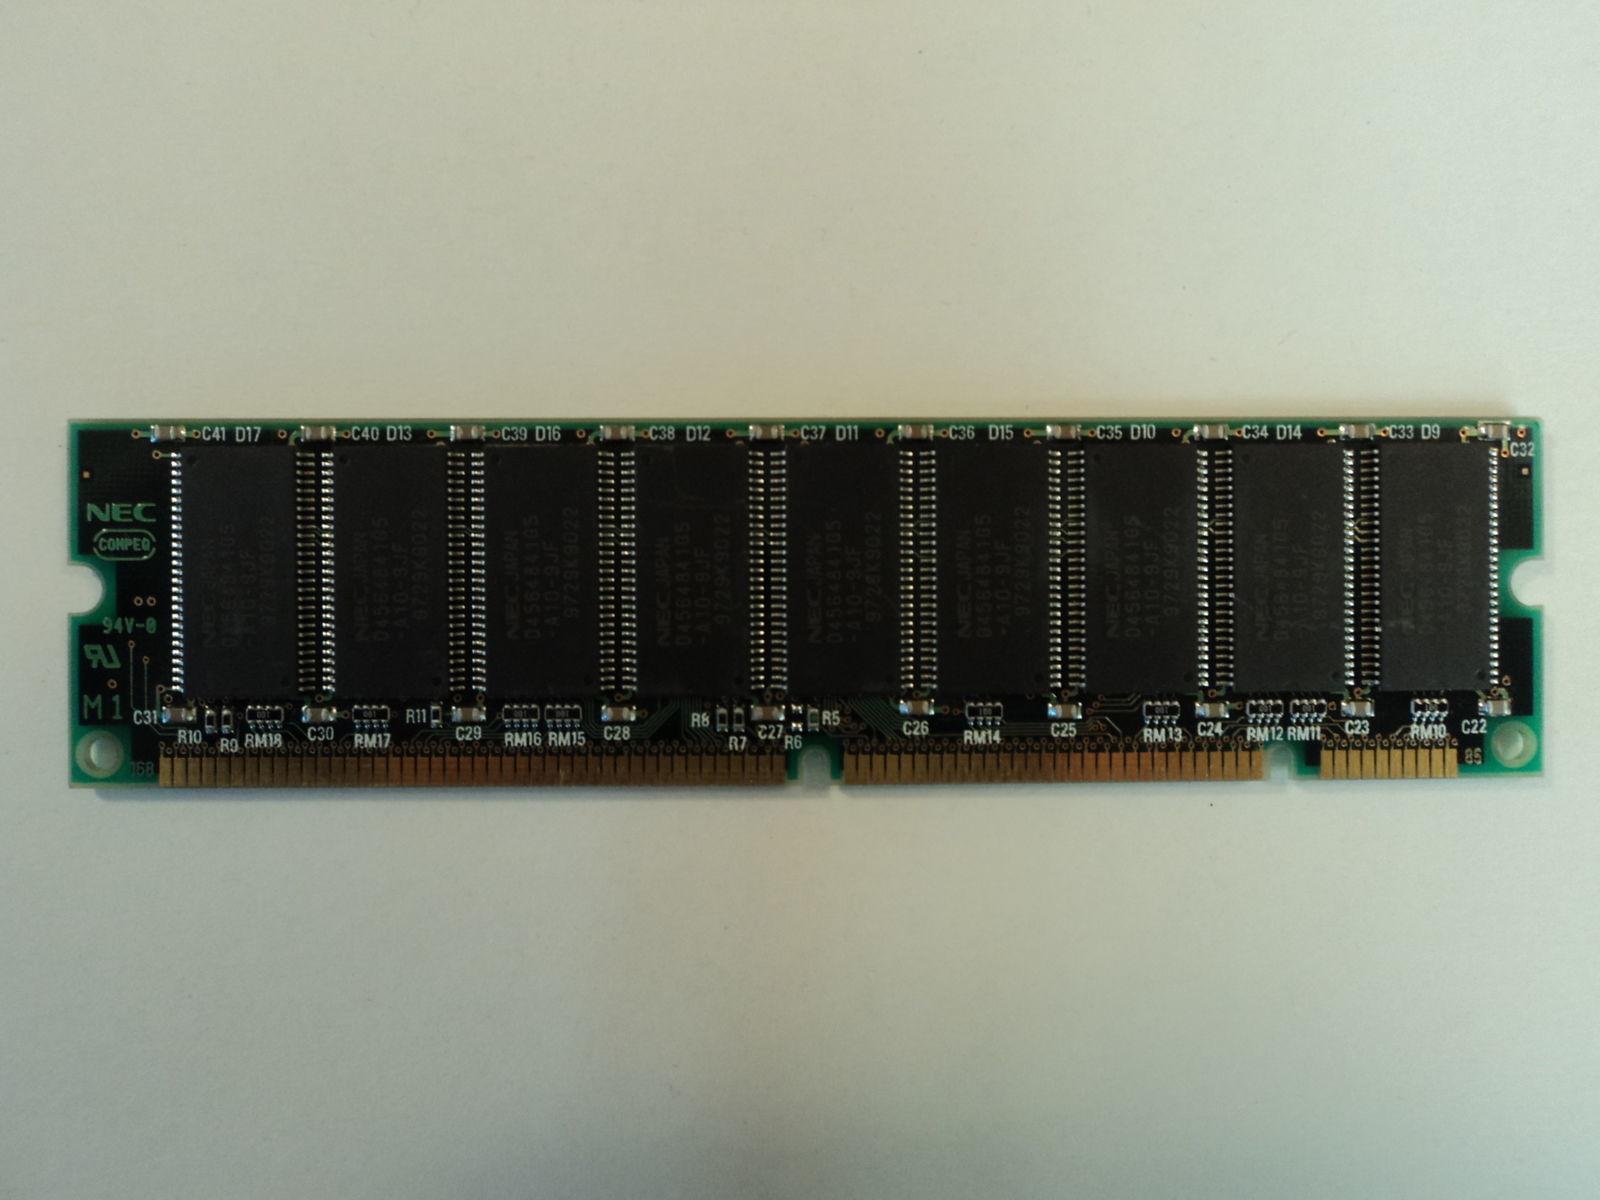 Toshiba RAM Memory Stick 64MB UNSDRAM TC59S6408FT-10 16 x 64 17995 Goldenram